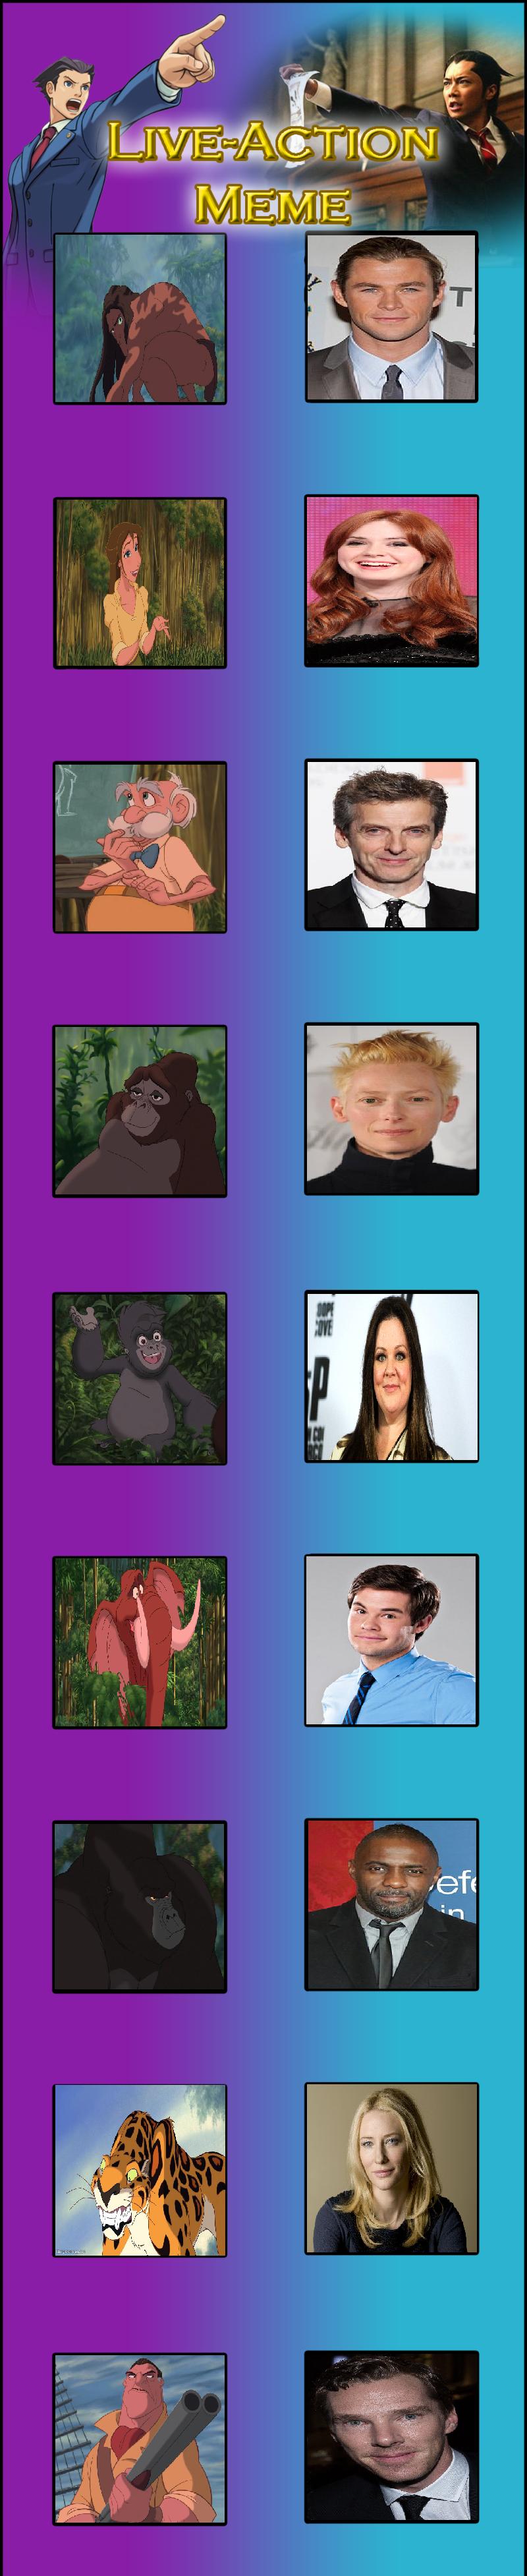 Tarzan Live Action Cast by Prentis-65